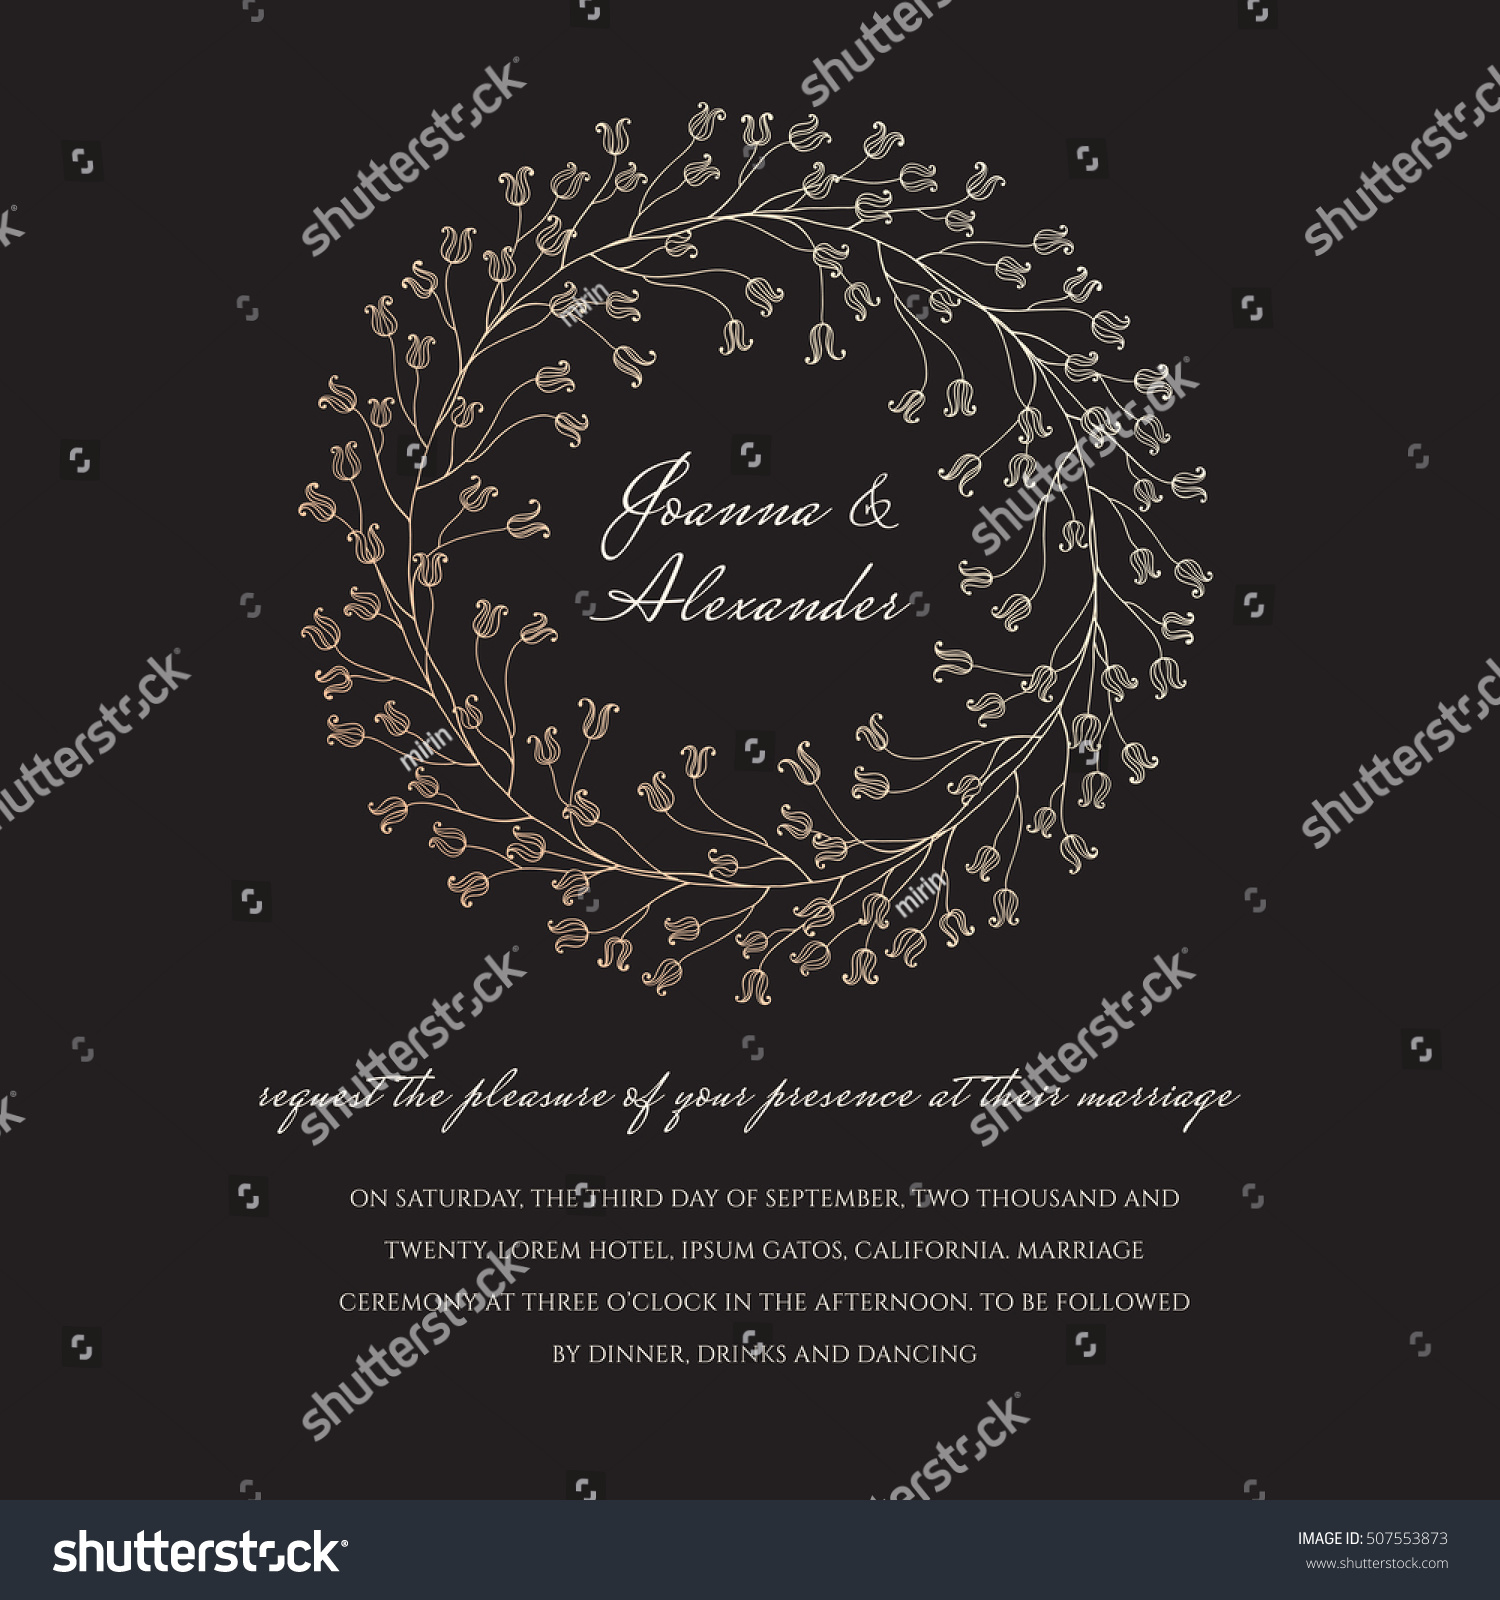 Wedding Invite Sample Floral Sparkling Wreath Stock Vector 507553873 ...